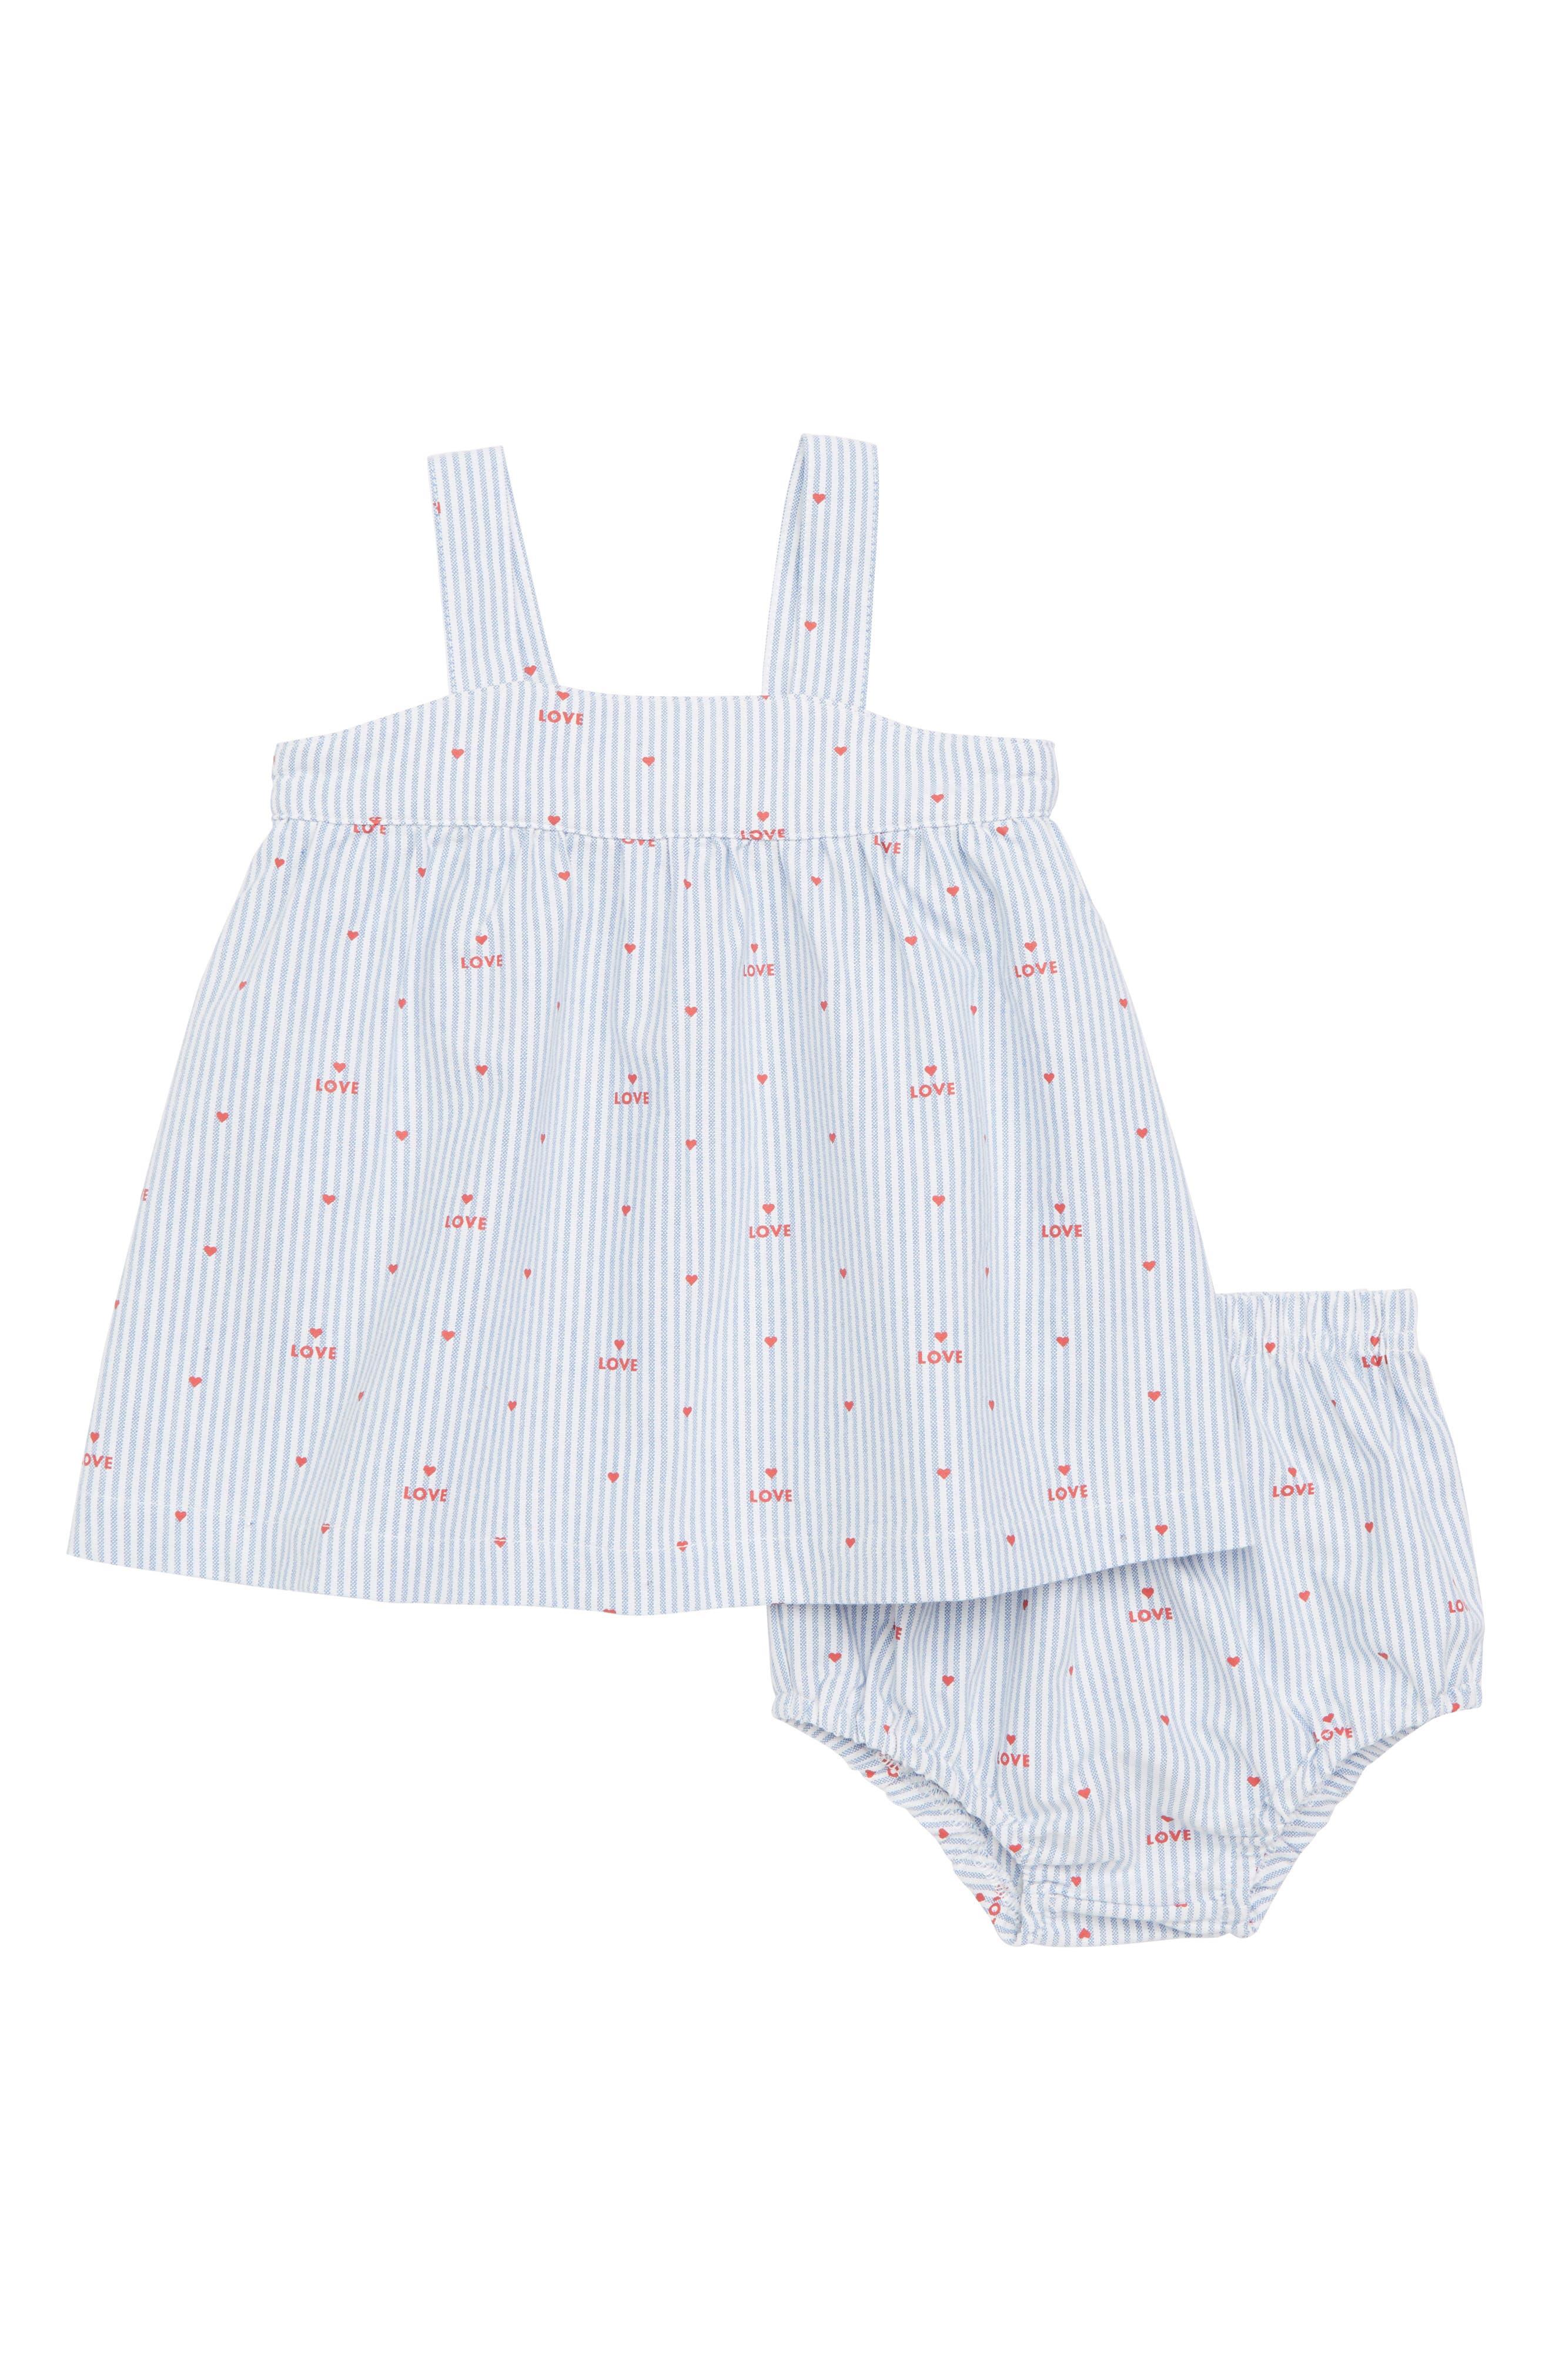 Pinstripe Swing Dress,                         Main,                         color, White/ Peach